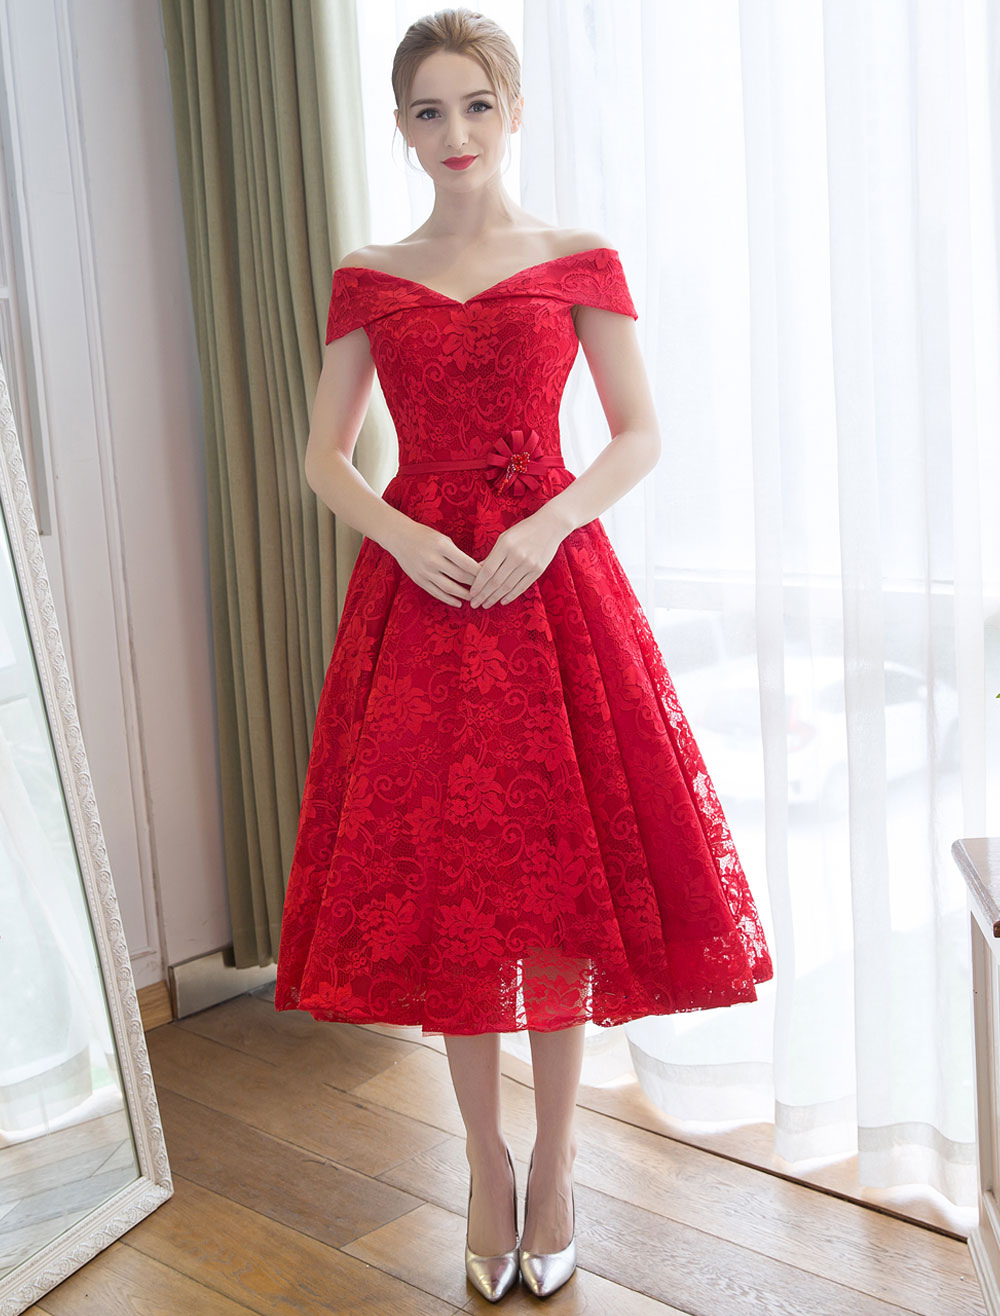 Lace Cocktail Dresses Off The Shoulder Red Lace Up Sash Tea Length Short Party Dress